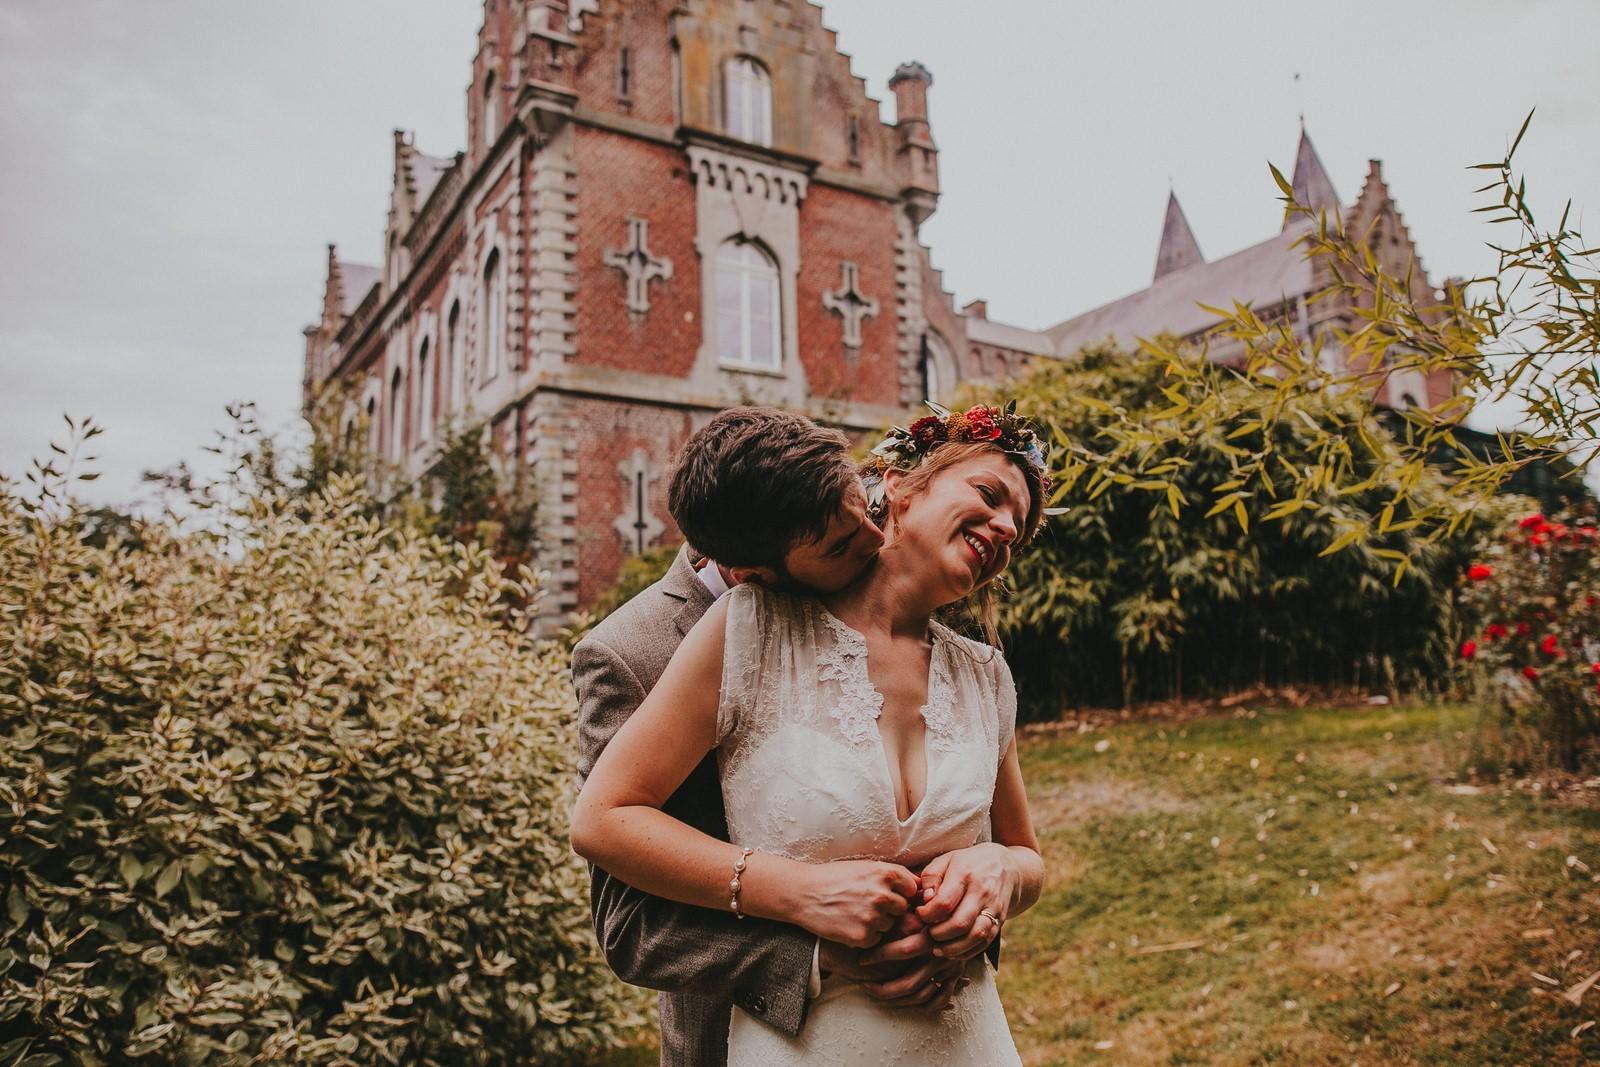 photographe mariage chateau de bourgogne 64